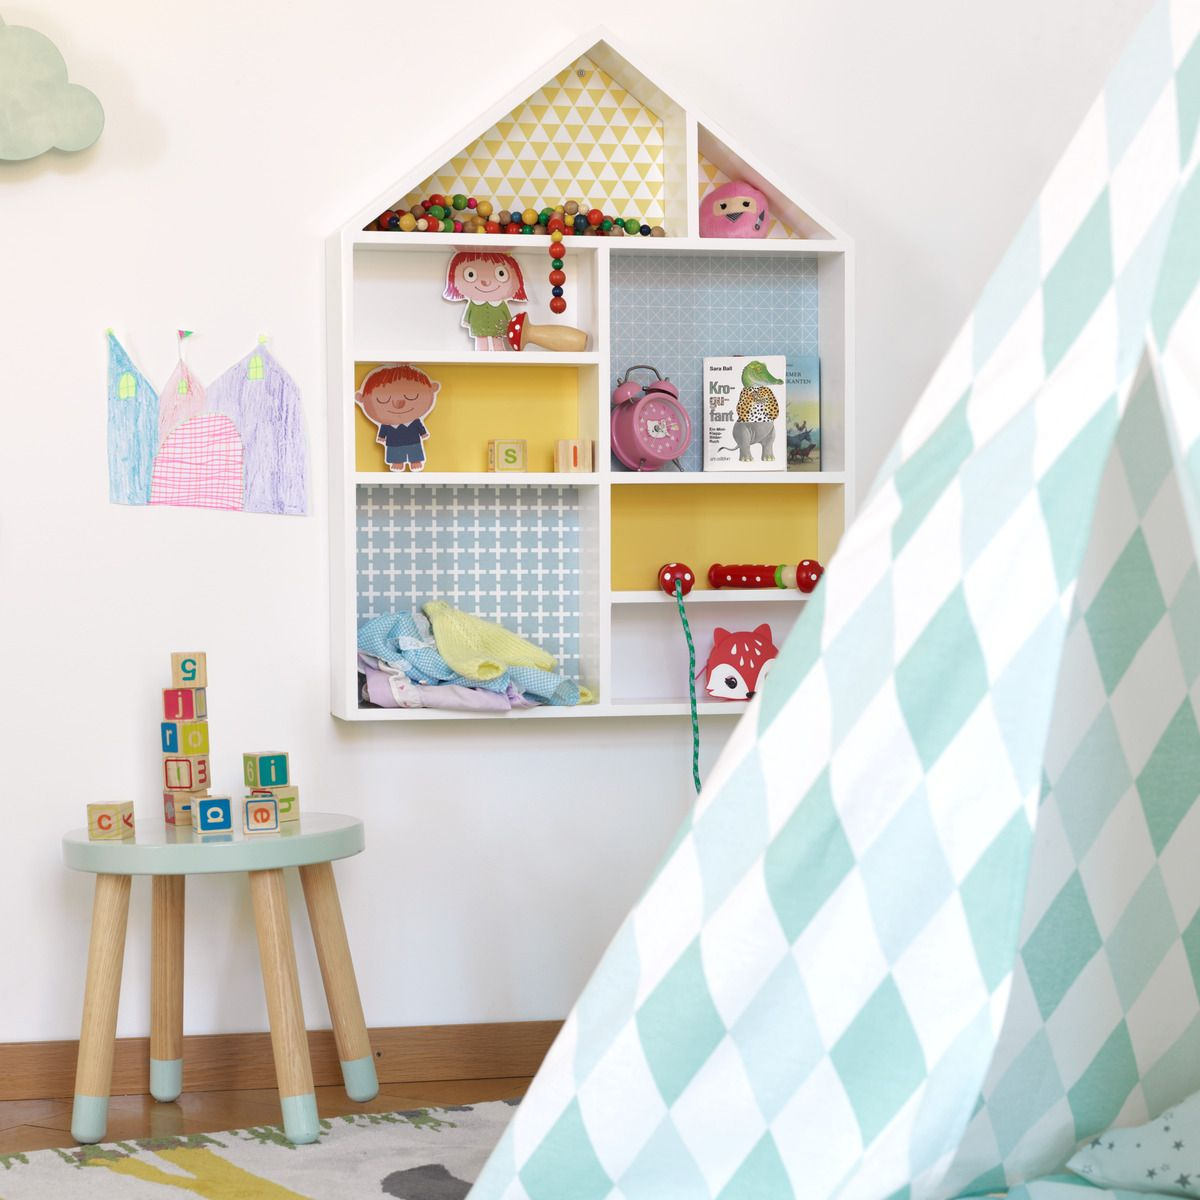 Micasa Kinderzimmer mit Wandregal TOLO & Kinderhocker FLEXA PLAY ...